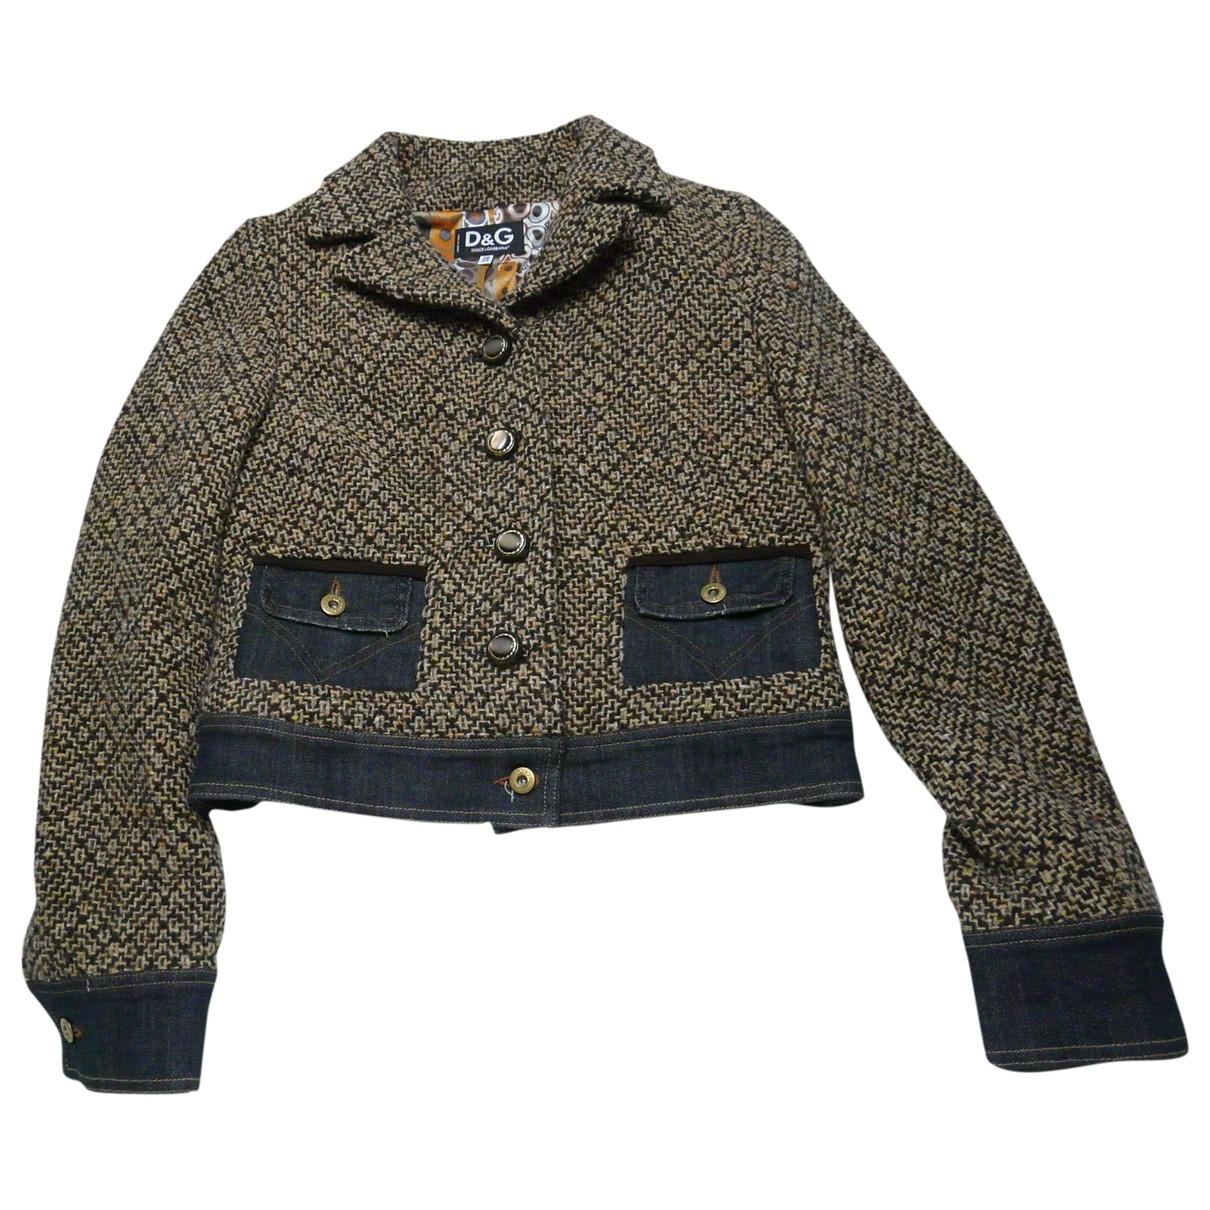 D&g \N Tweed jacket for Women 44 IT